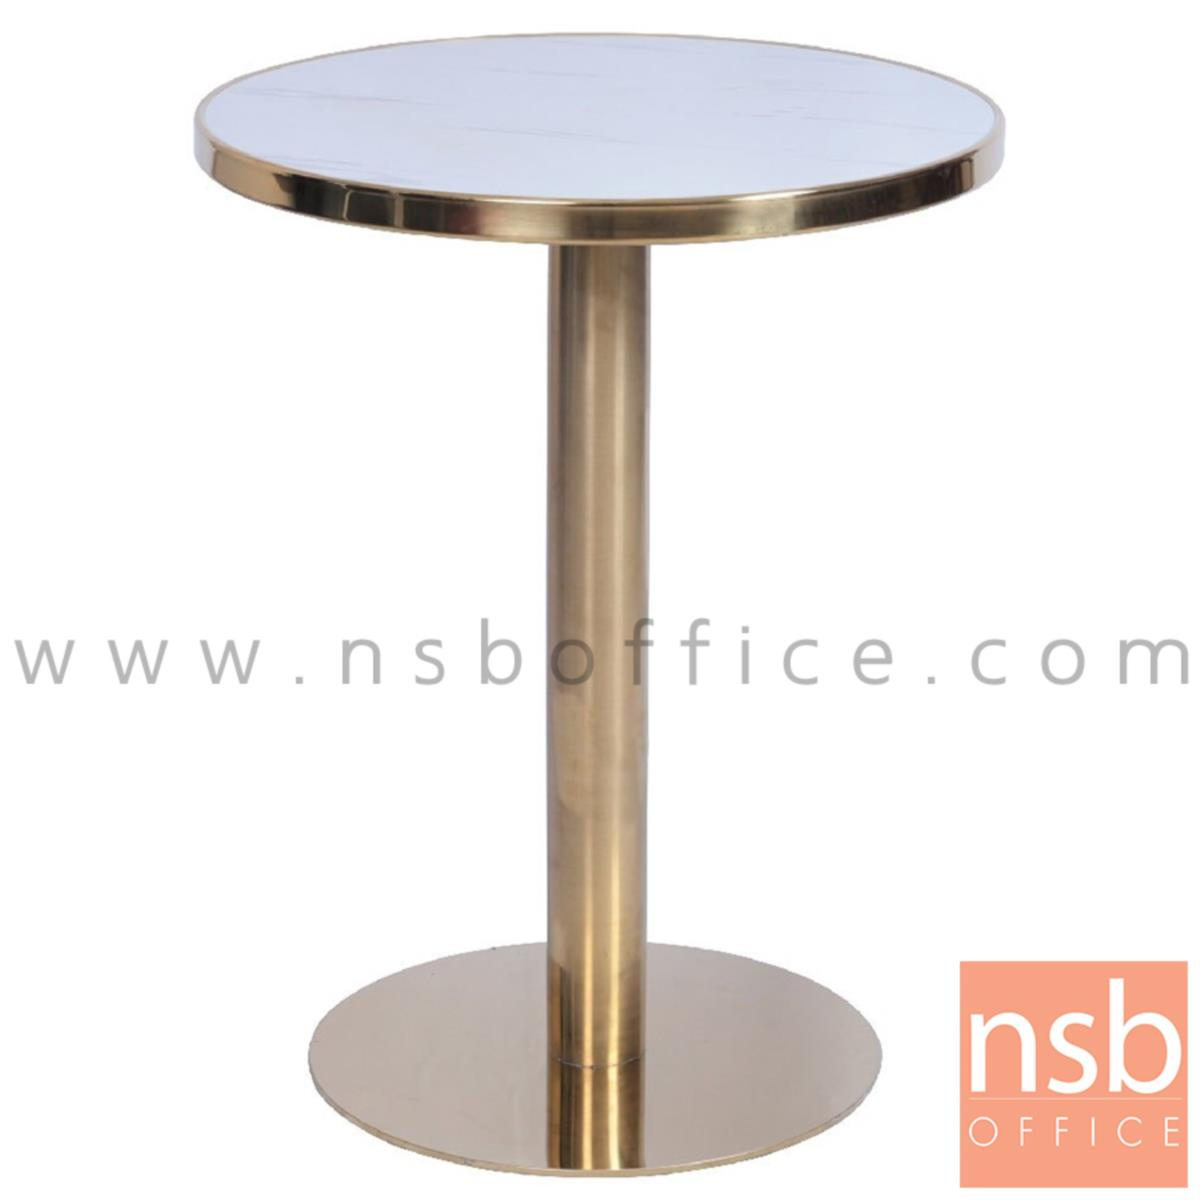 A14A252:โต๊ะบาร์ COFFEE รุ่น Forli (ฟลอริ) ขนาด 59Di cm. หน้าท็อปไม้ลายหินอ่อน ขาเหล็กทอง